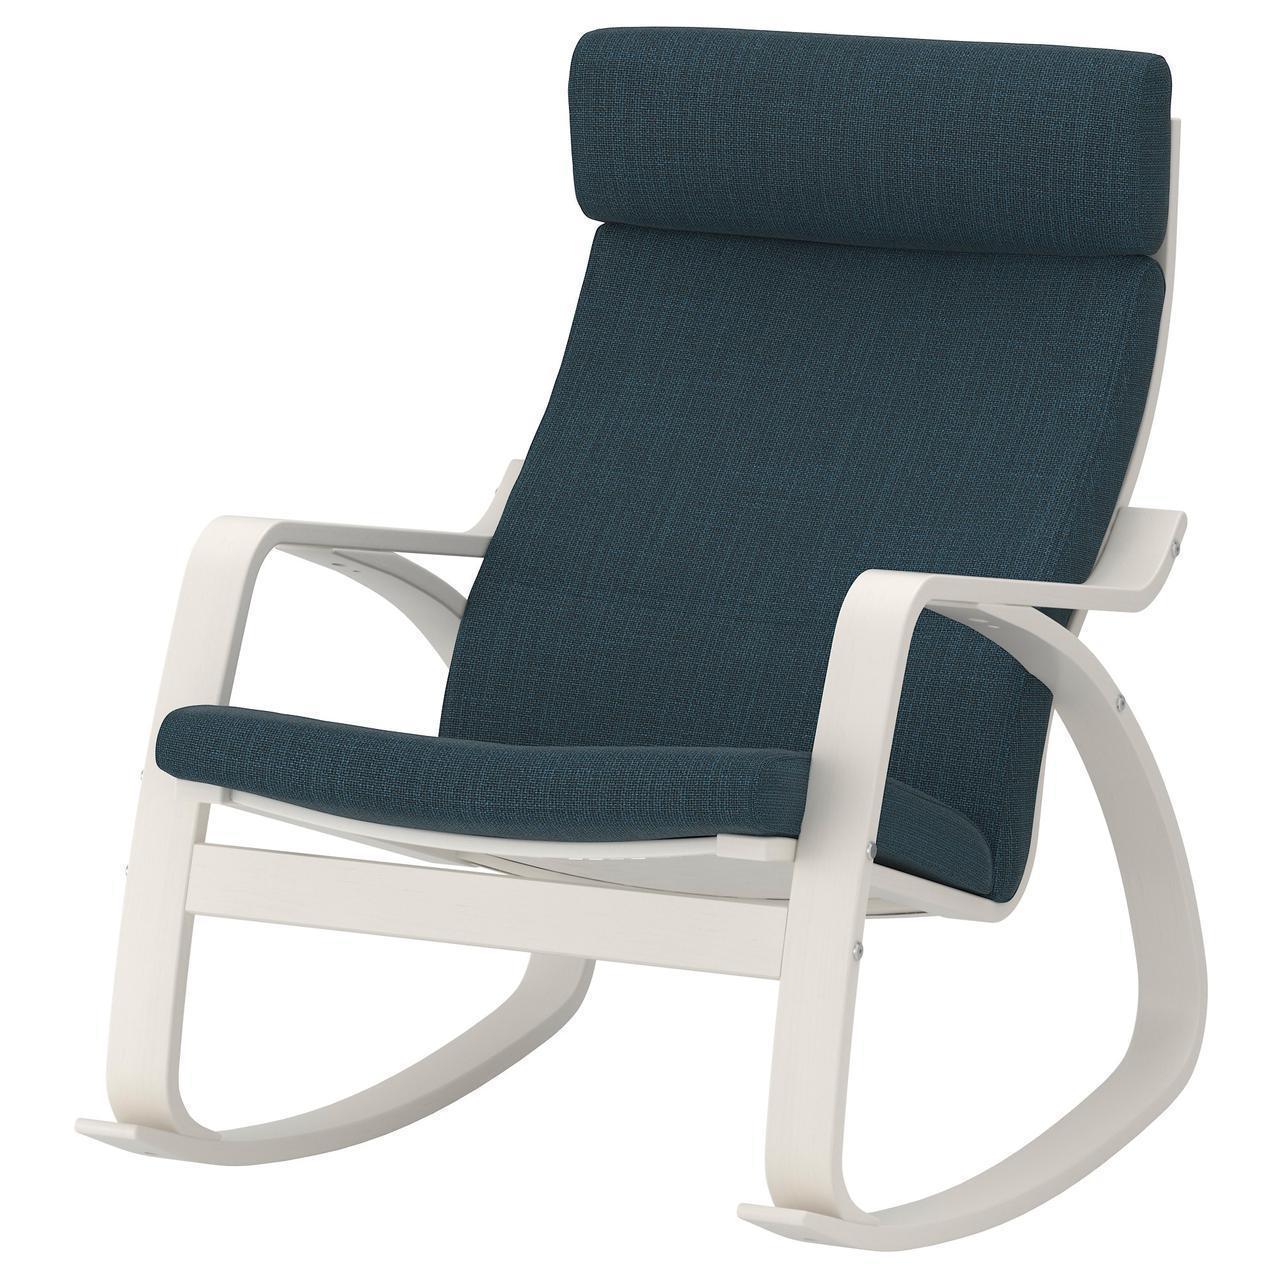 Кресло-качалка IKEA POÄNG Hillared темно-синее 192.010.70